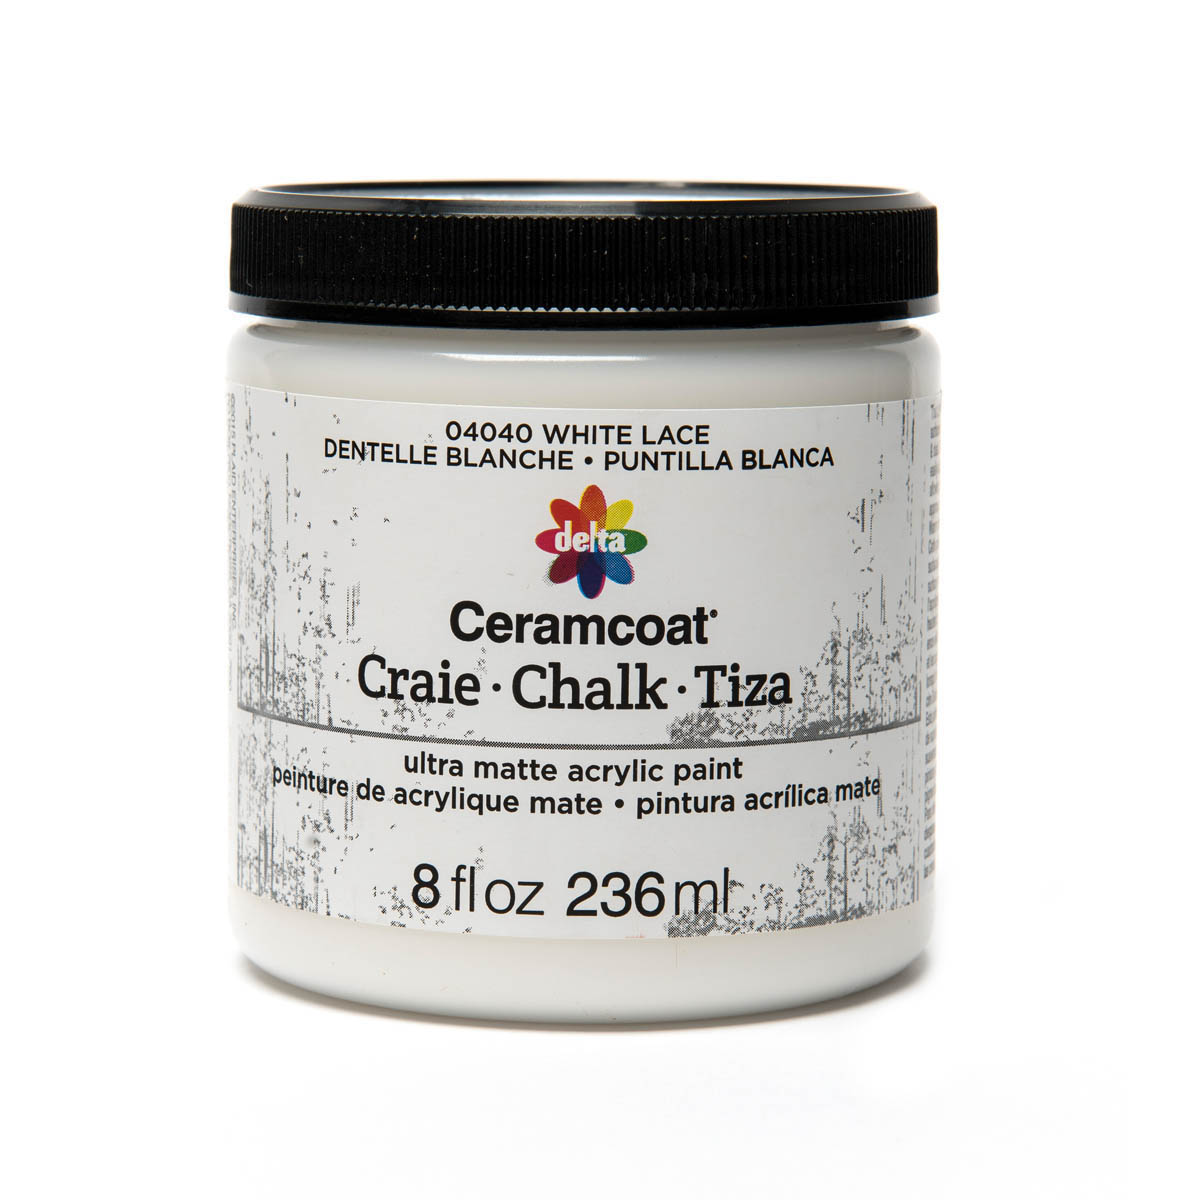 Delta Ceramcoat ® Chalk - White Lace, 8 oz.